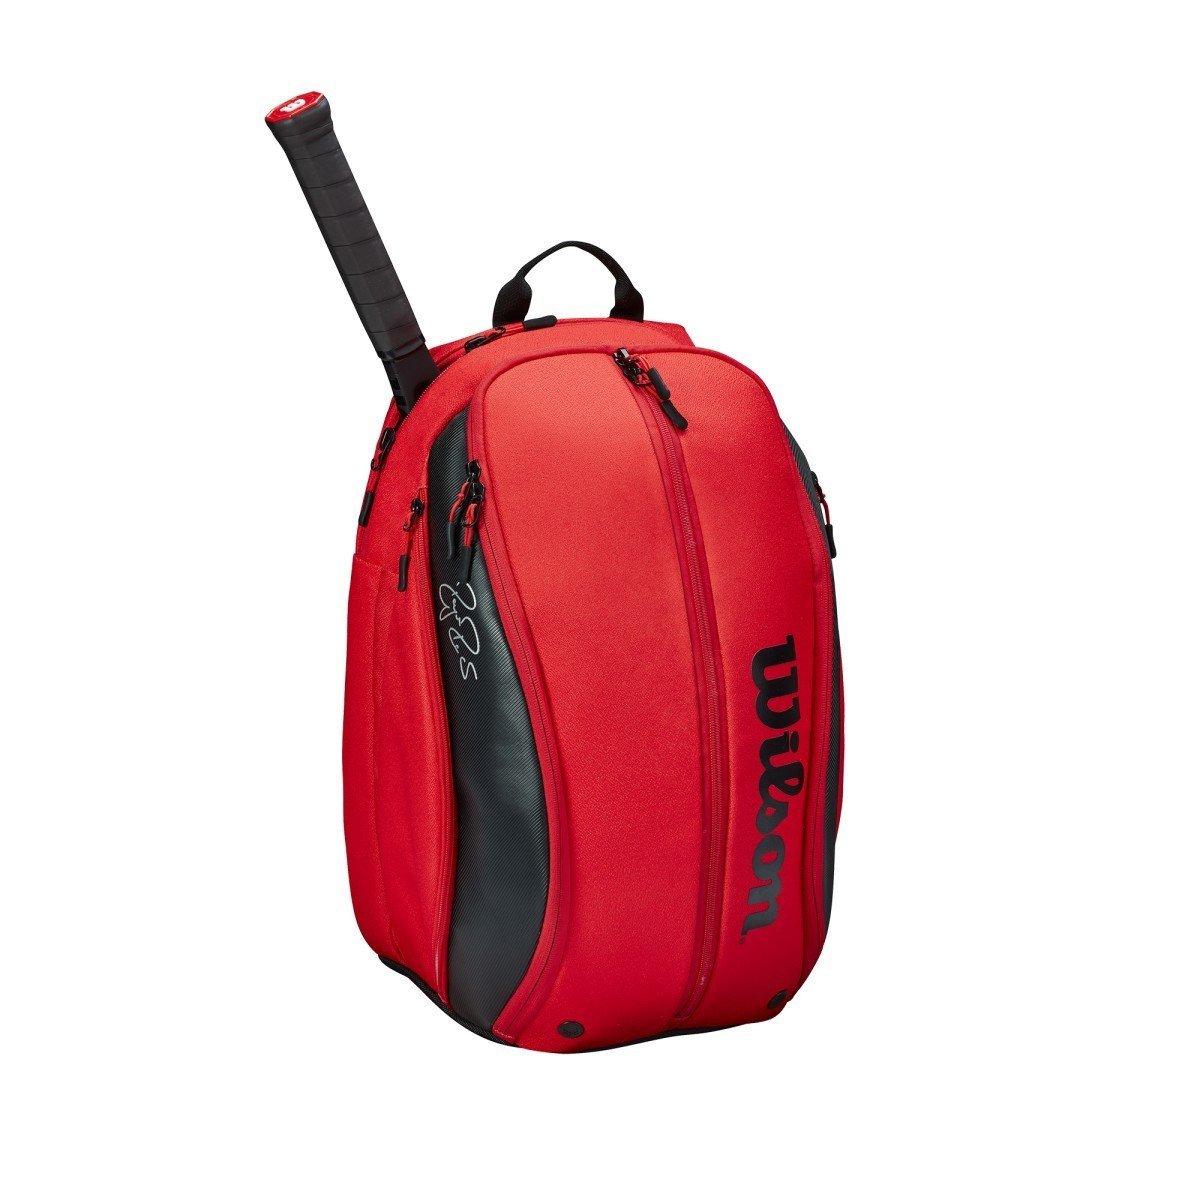 Wilson Tennis Backpack – Roger Federer DNA Backpack